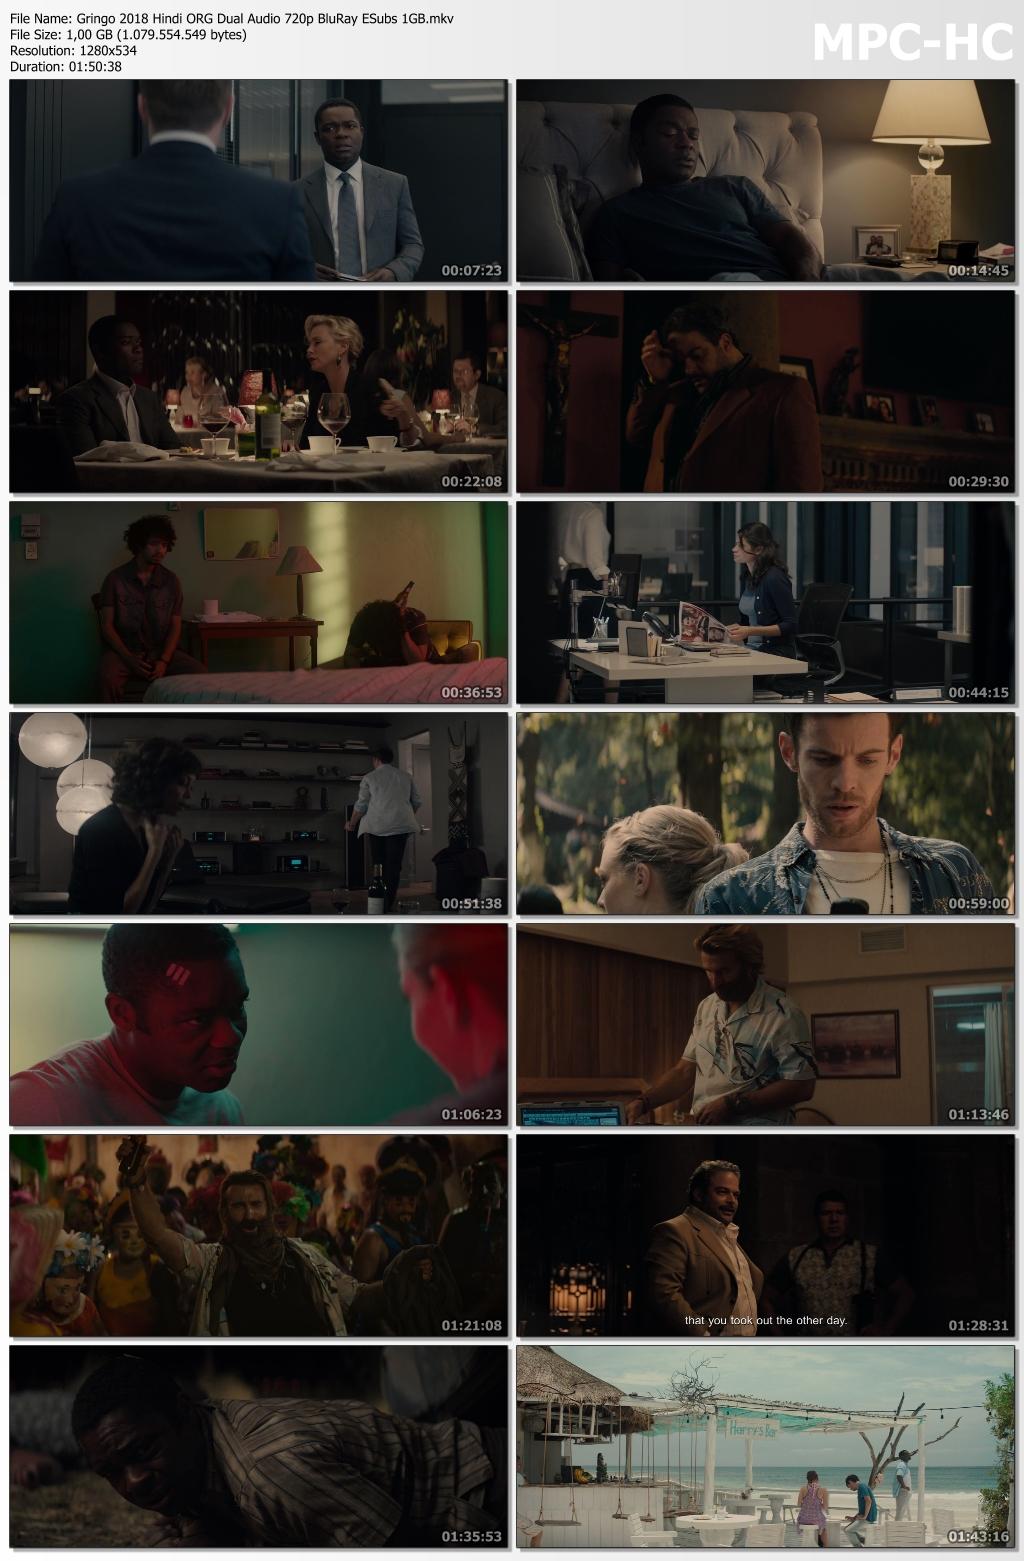 Gringo-2018-Hindi-ORG-Dual-Audio-720p-Blu-Ray-ESubs-1-GB-mkv-thumbs